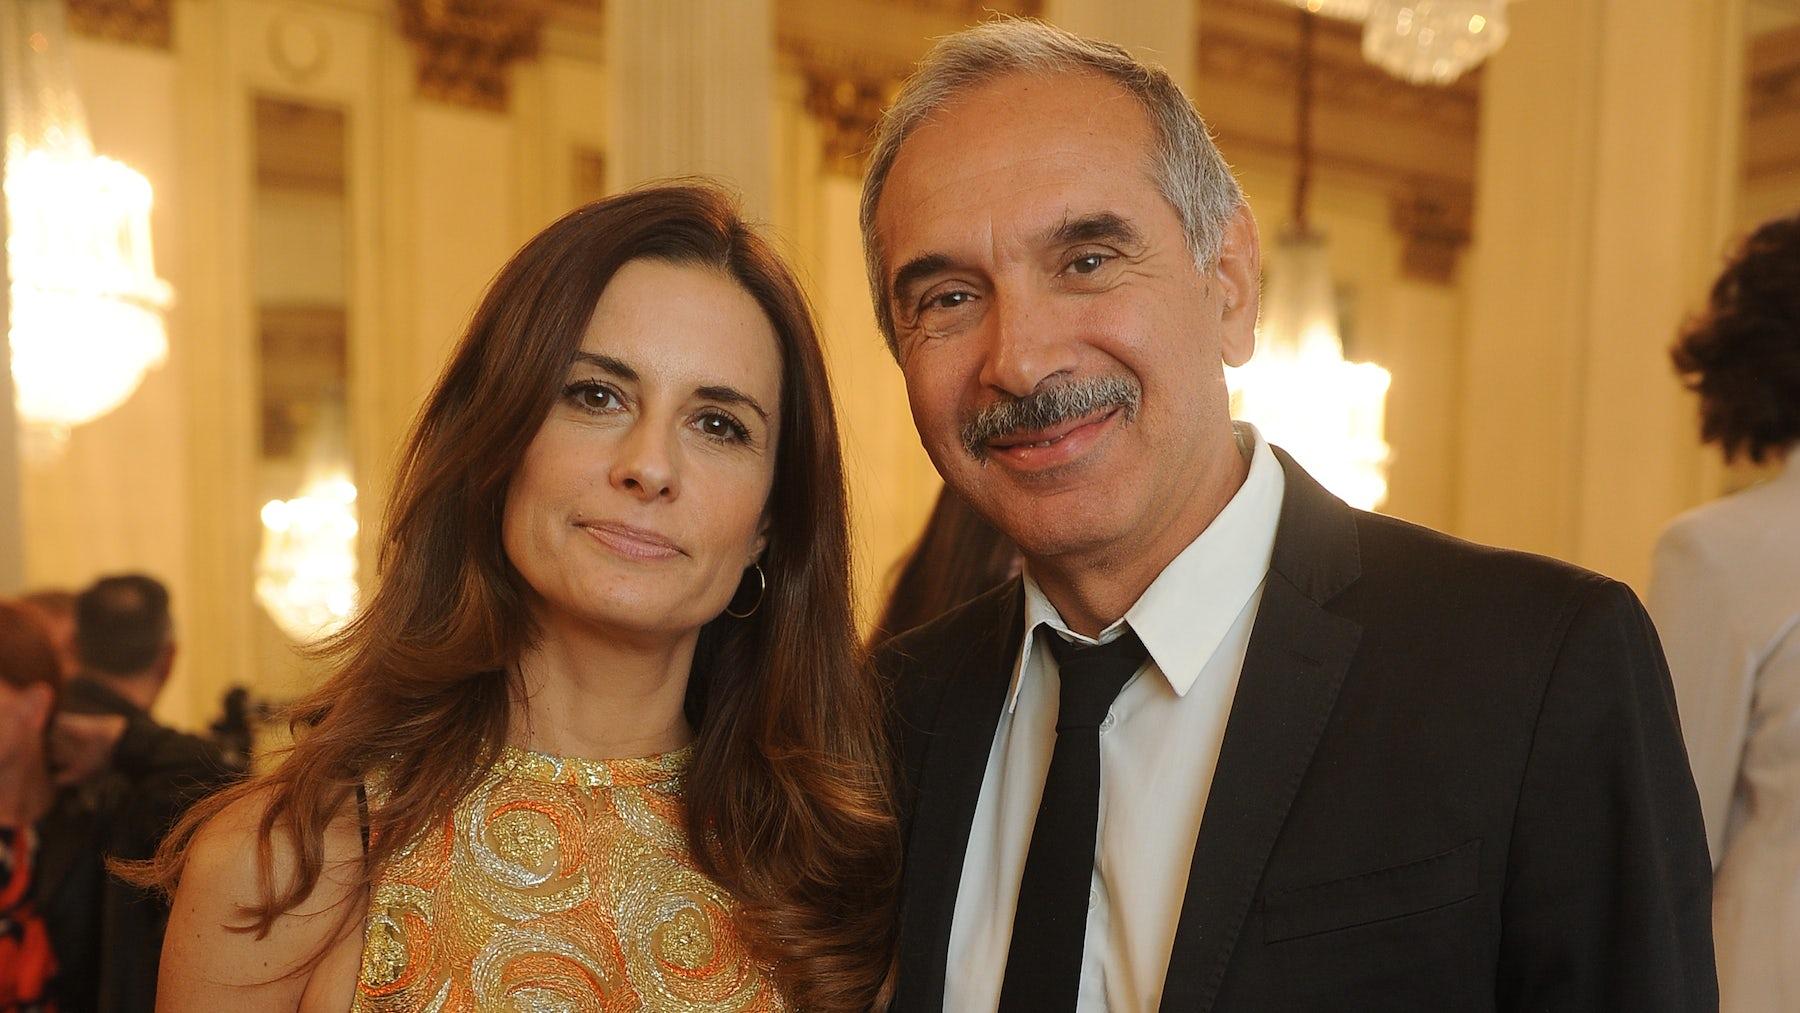 Eco-Age's Livia Firth with CNMI president Carlo Capasa | Source: Courtesy